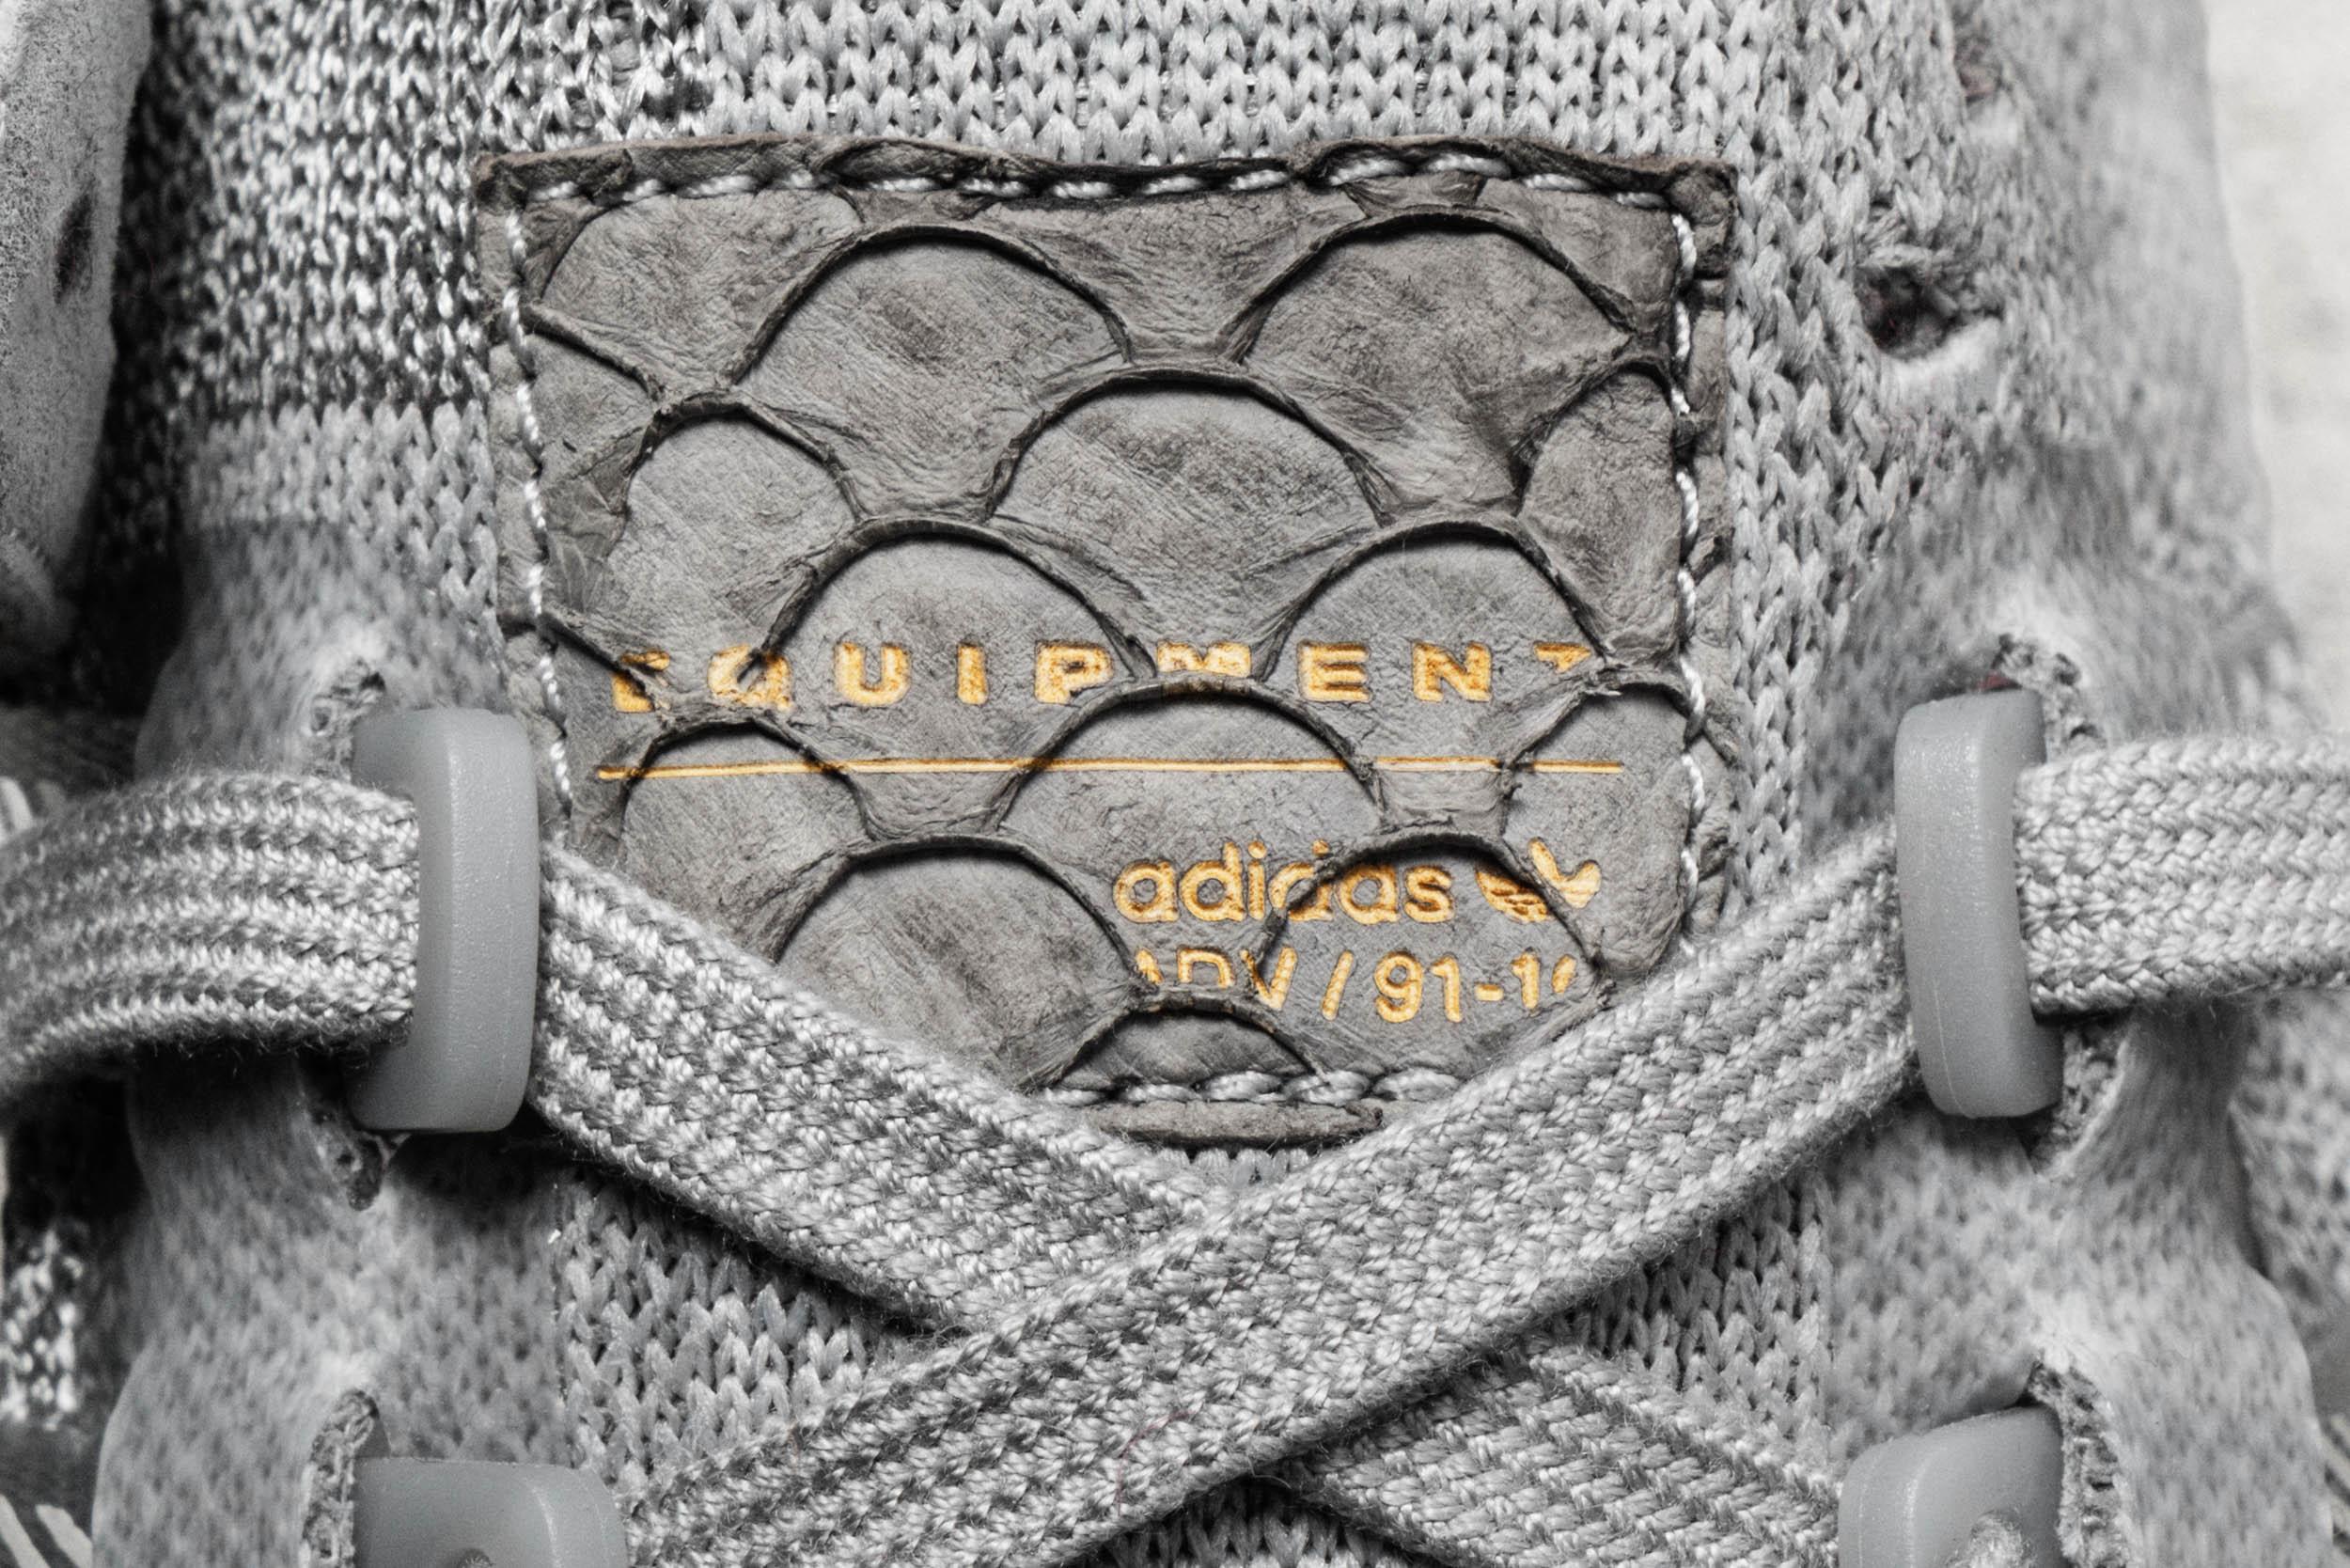 chaussure-pusha-t-x-adidas-equipment-91-16-boost-primeknit-king-push-4